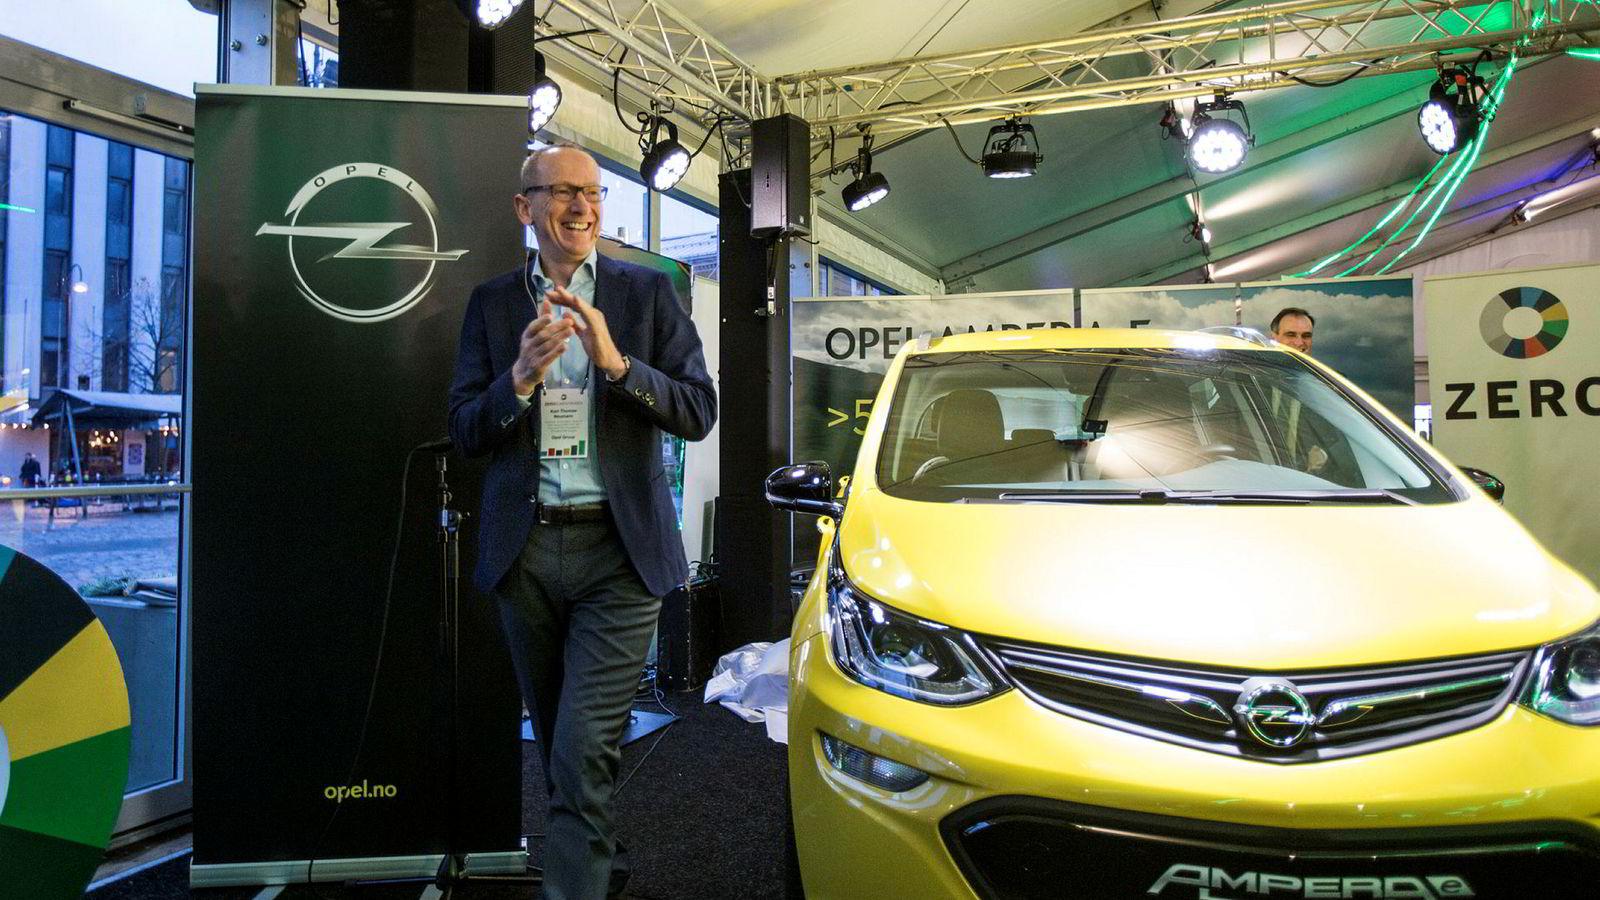 Opel-sjef Karl-Thomas Neumann presenterte Ampera, Opel nye elbil, under årets Zero-konferanse.